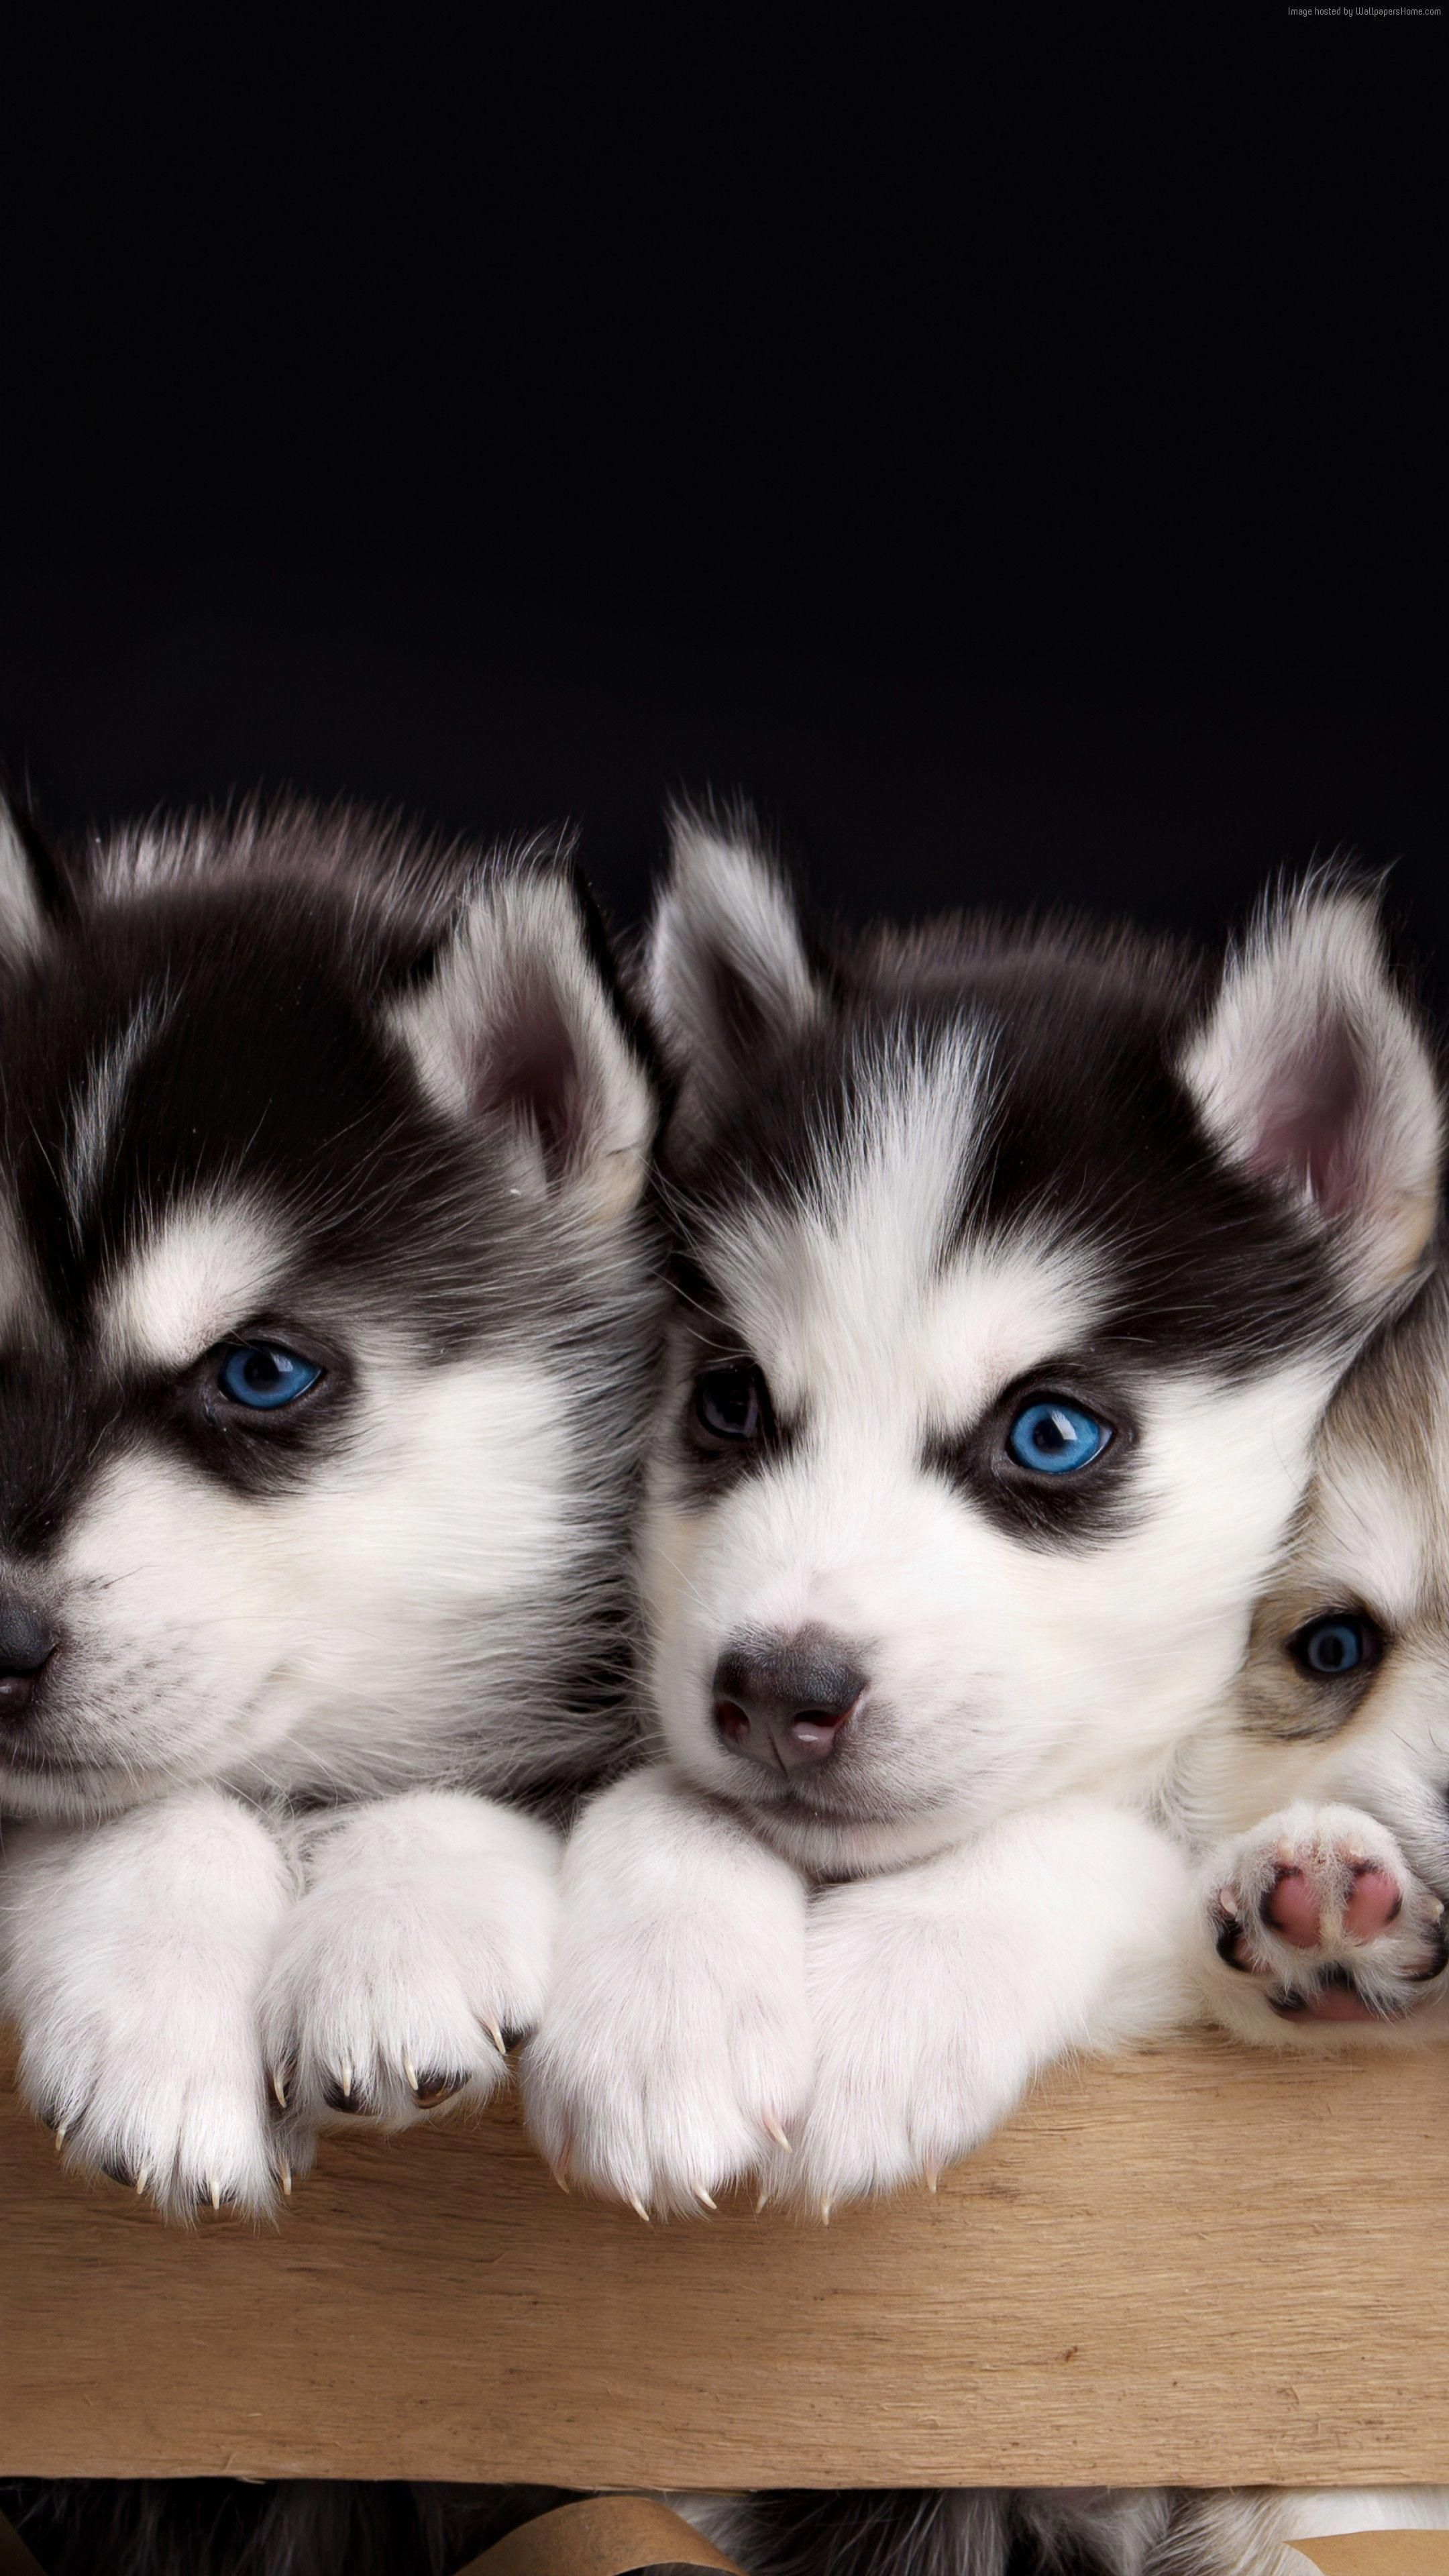 Labradorpuppyfood Siberianhuskypuppy Cute Puppy Wallpaper Cute Puppies Puppies